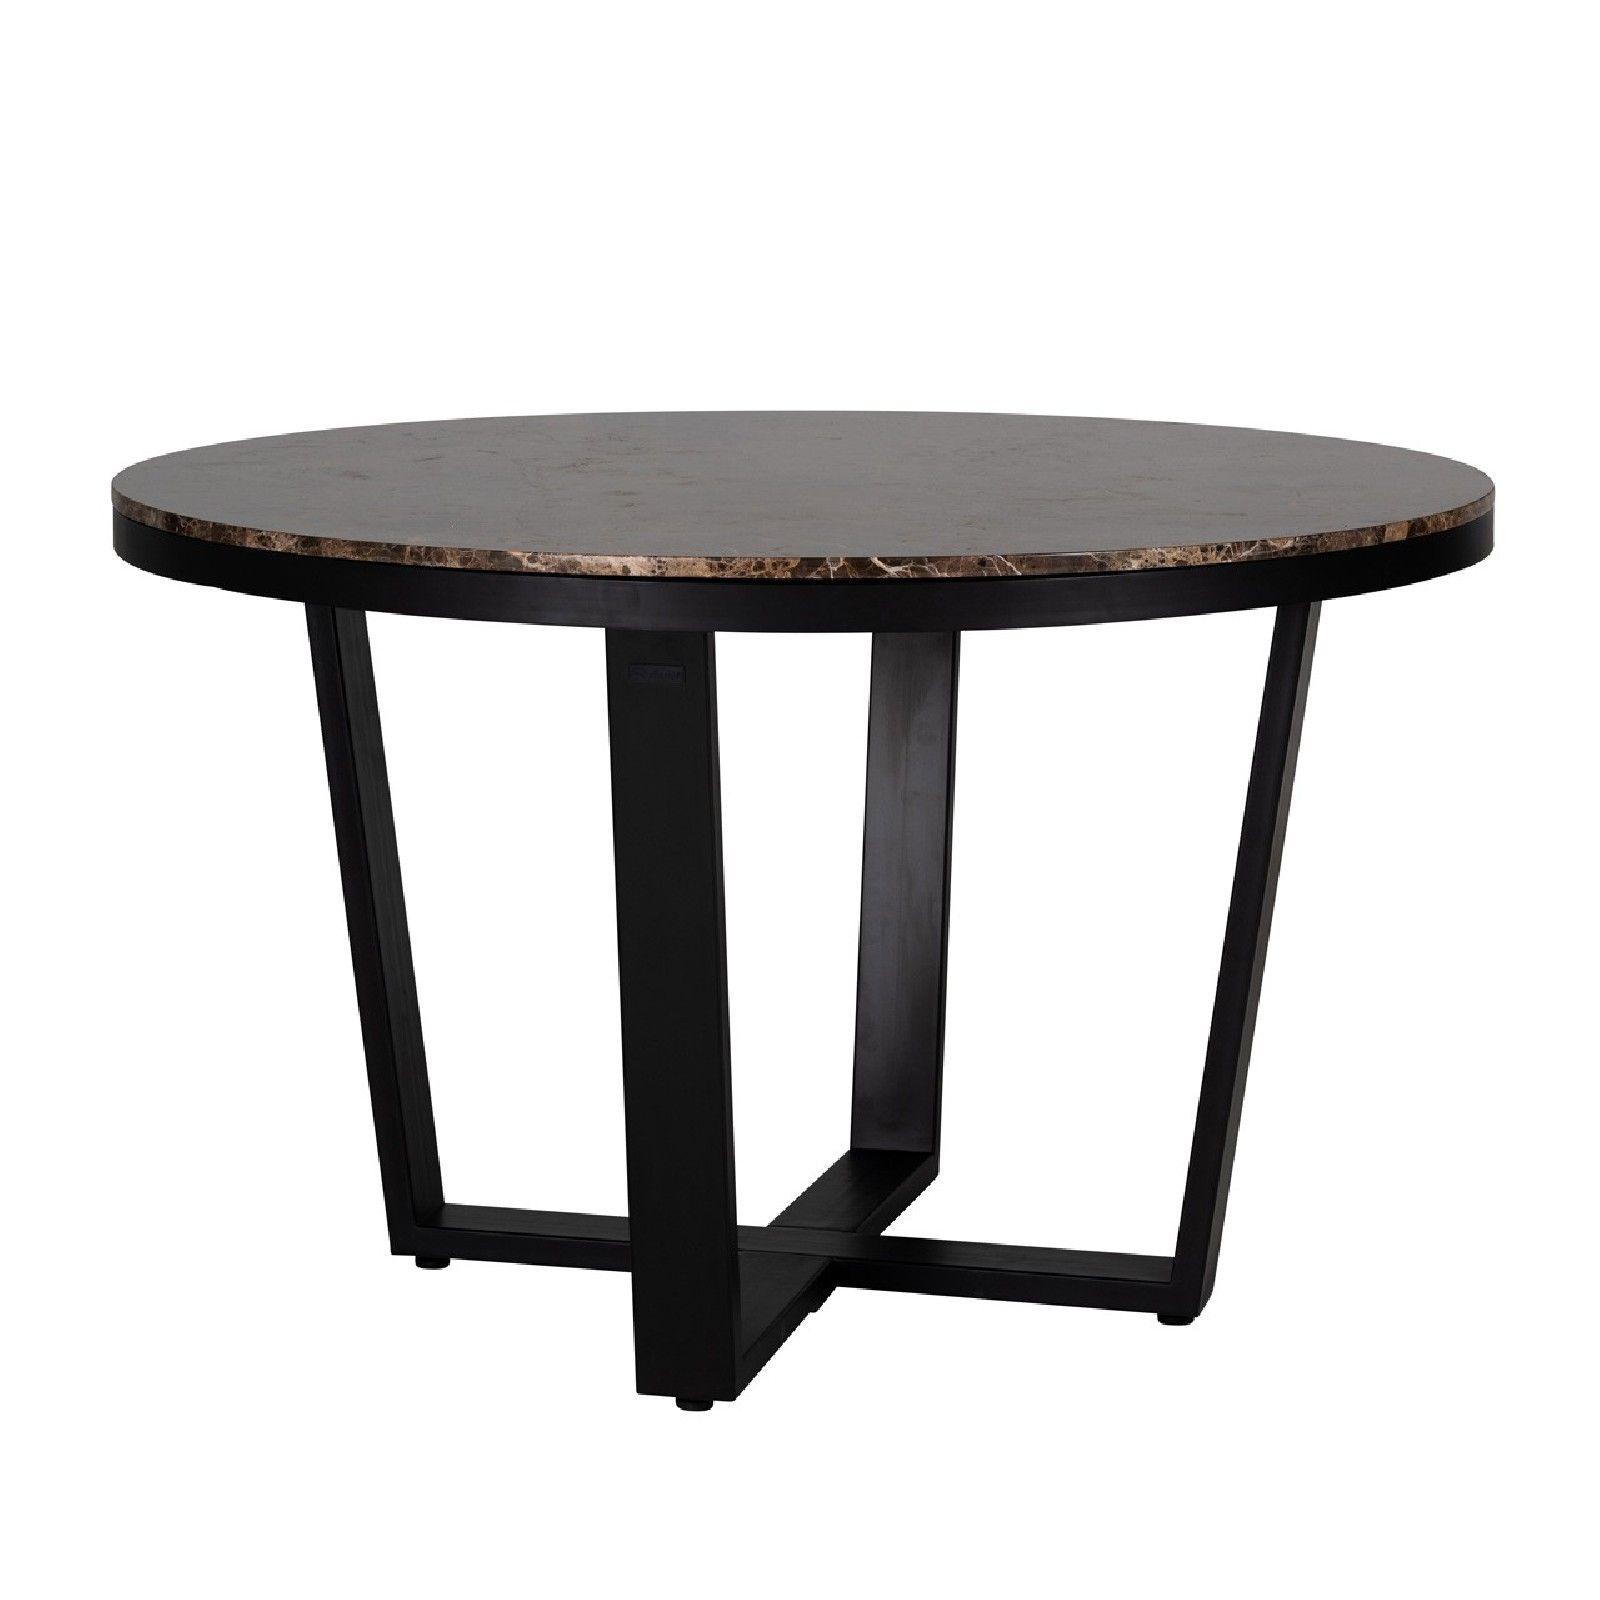 Table à dîner Dalton brown emperador rond 130Ø Meuble Déco Tendance - 588